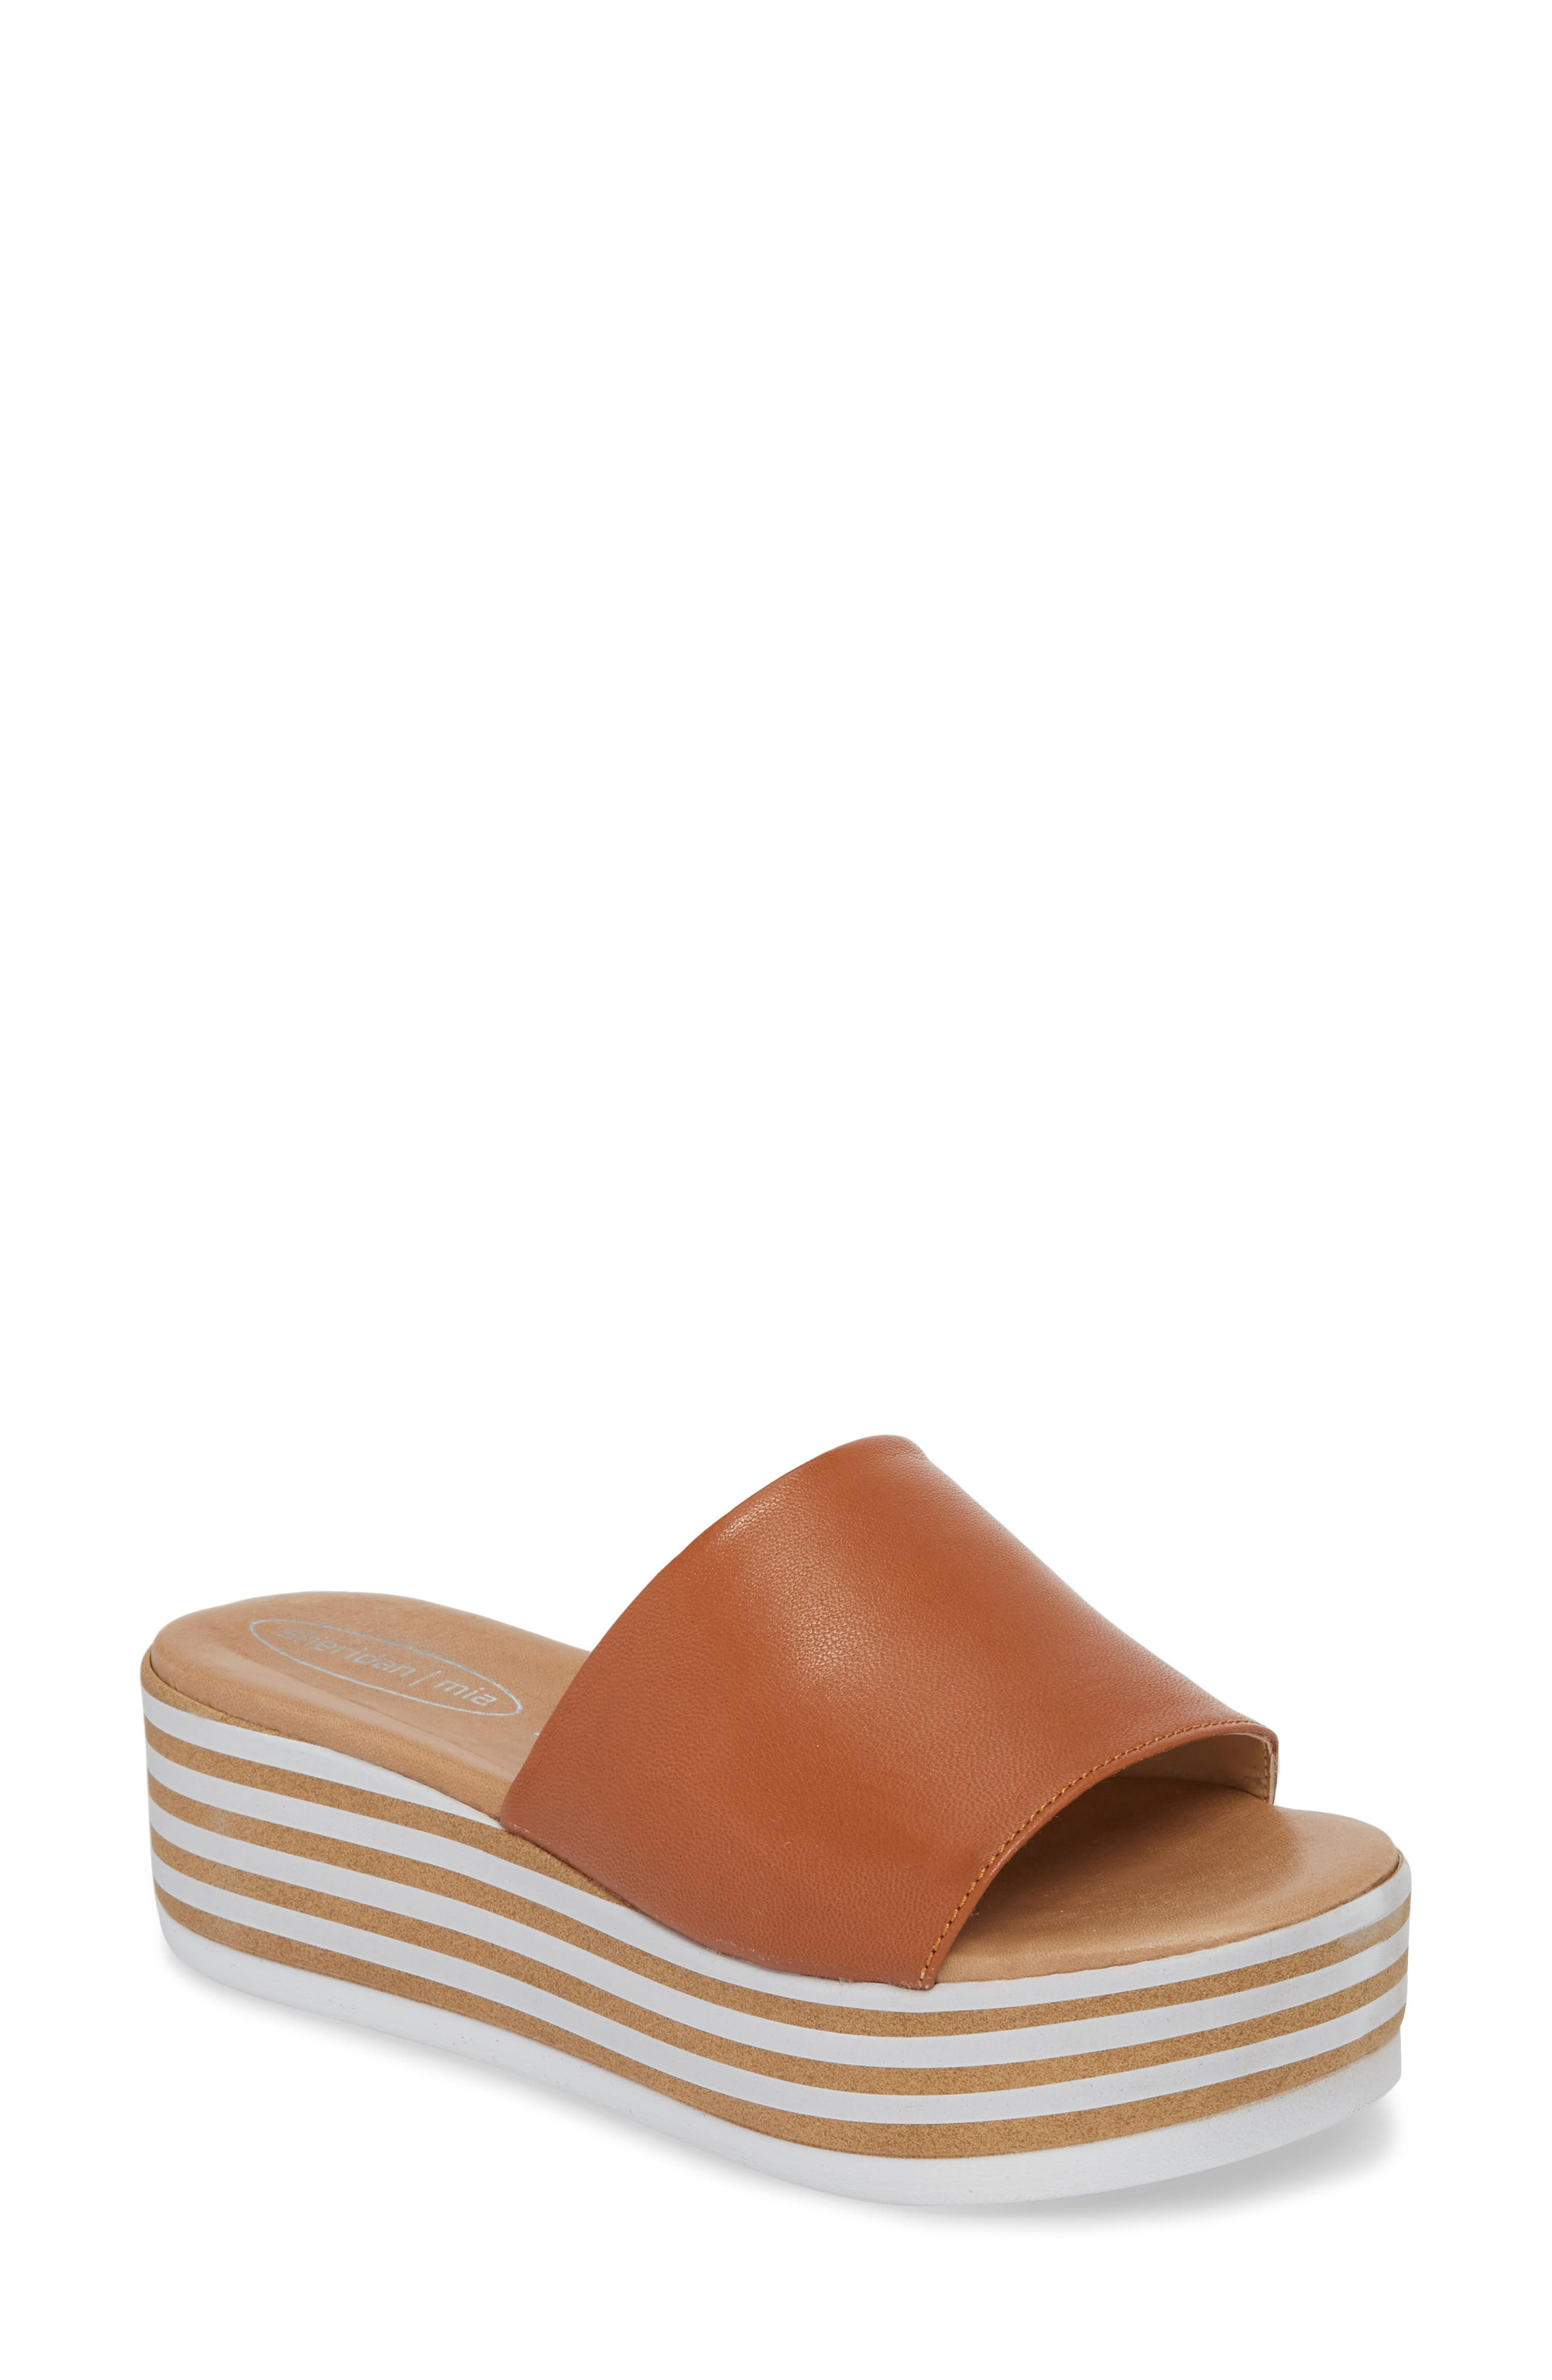 Sheridan Mia Reesa Platform Slide Sandal, Brown